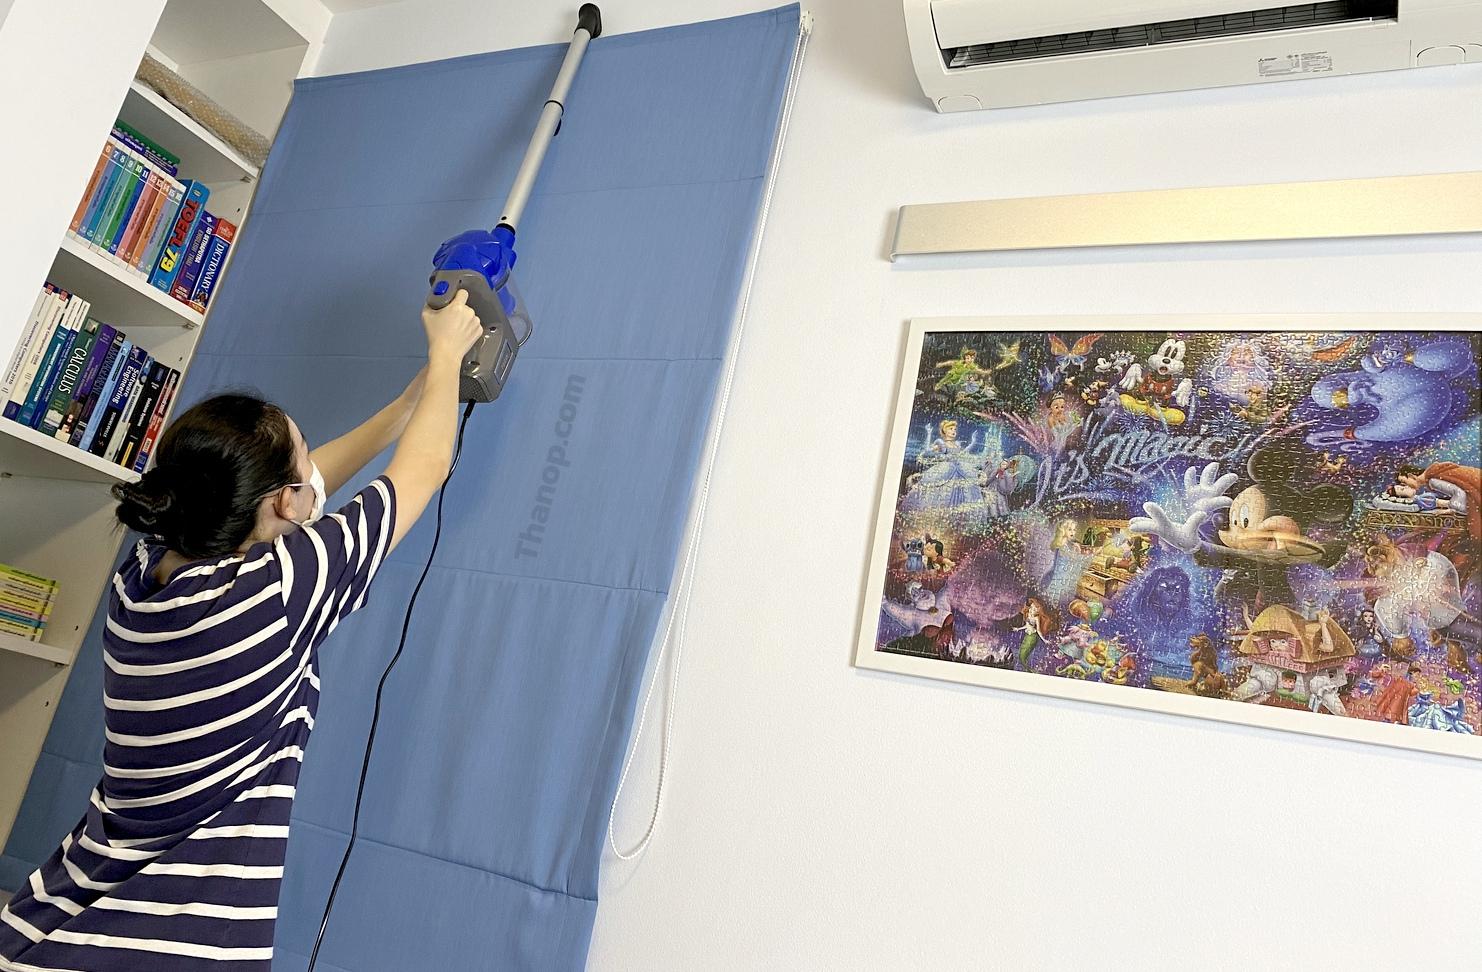 jowsua-cyclone-vacuum-cleaner-featured-image